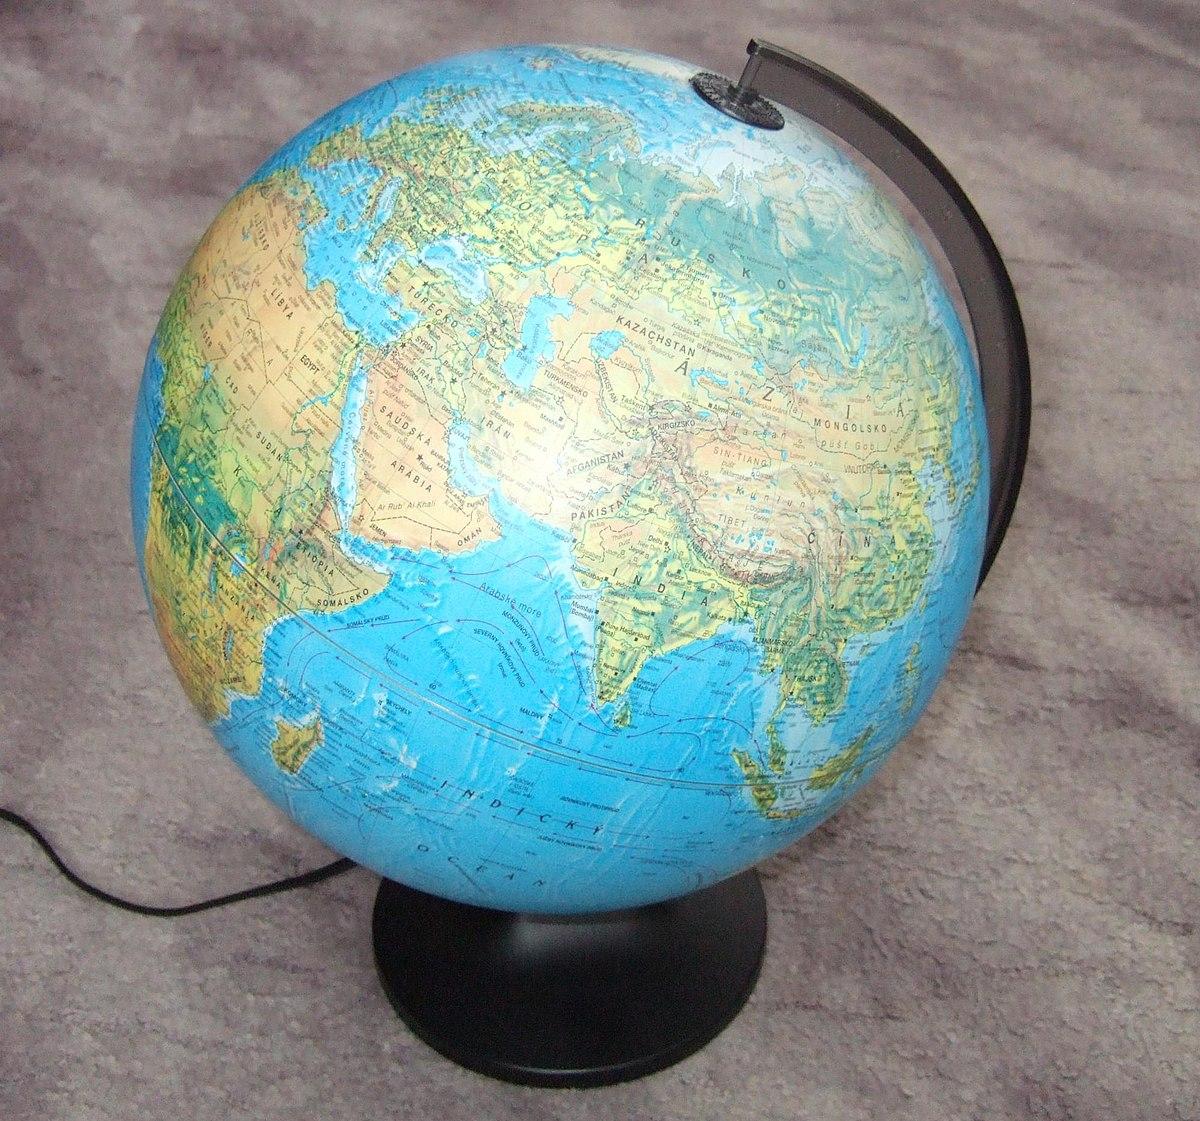 Globo terráqueo - Wikipedia, la enciclopedia libre